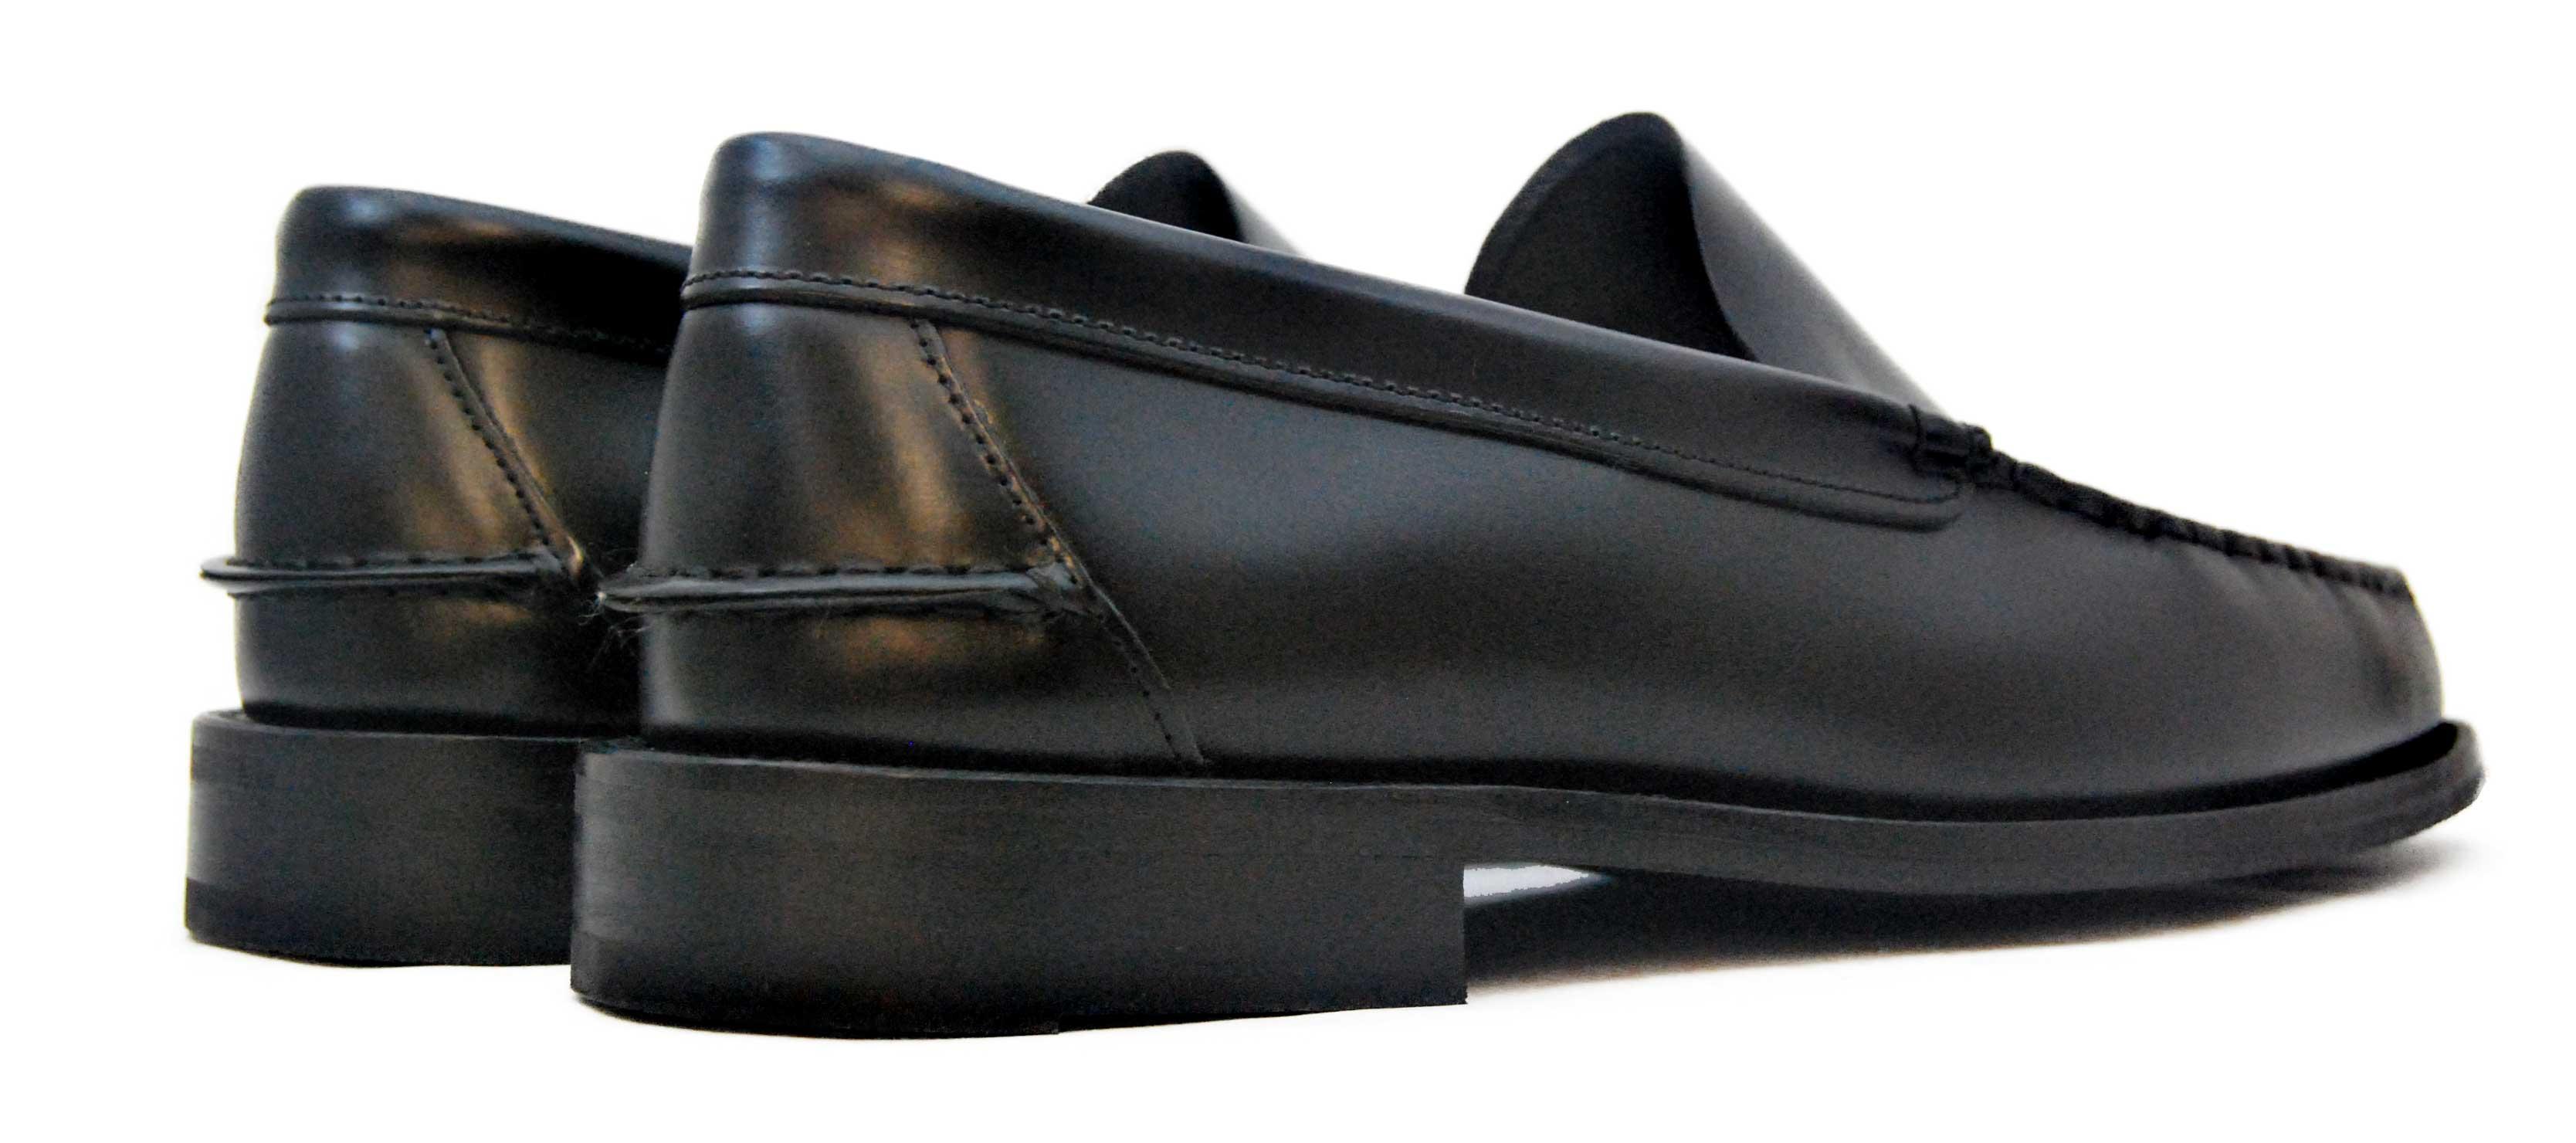 Foto 4 de Zapato Castellano 102 Liso Negro Botones